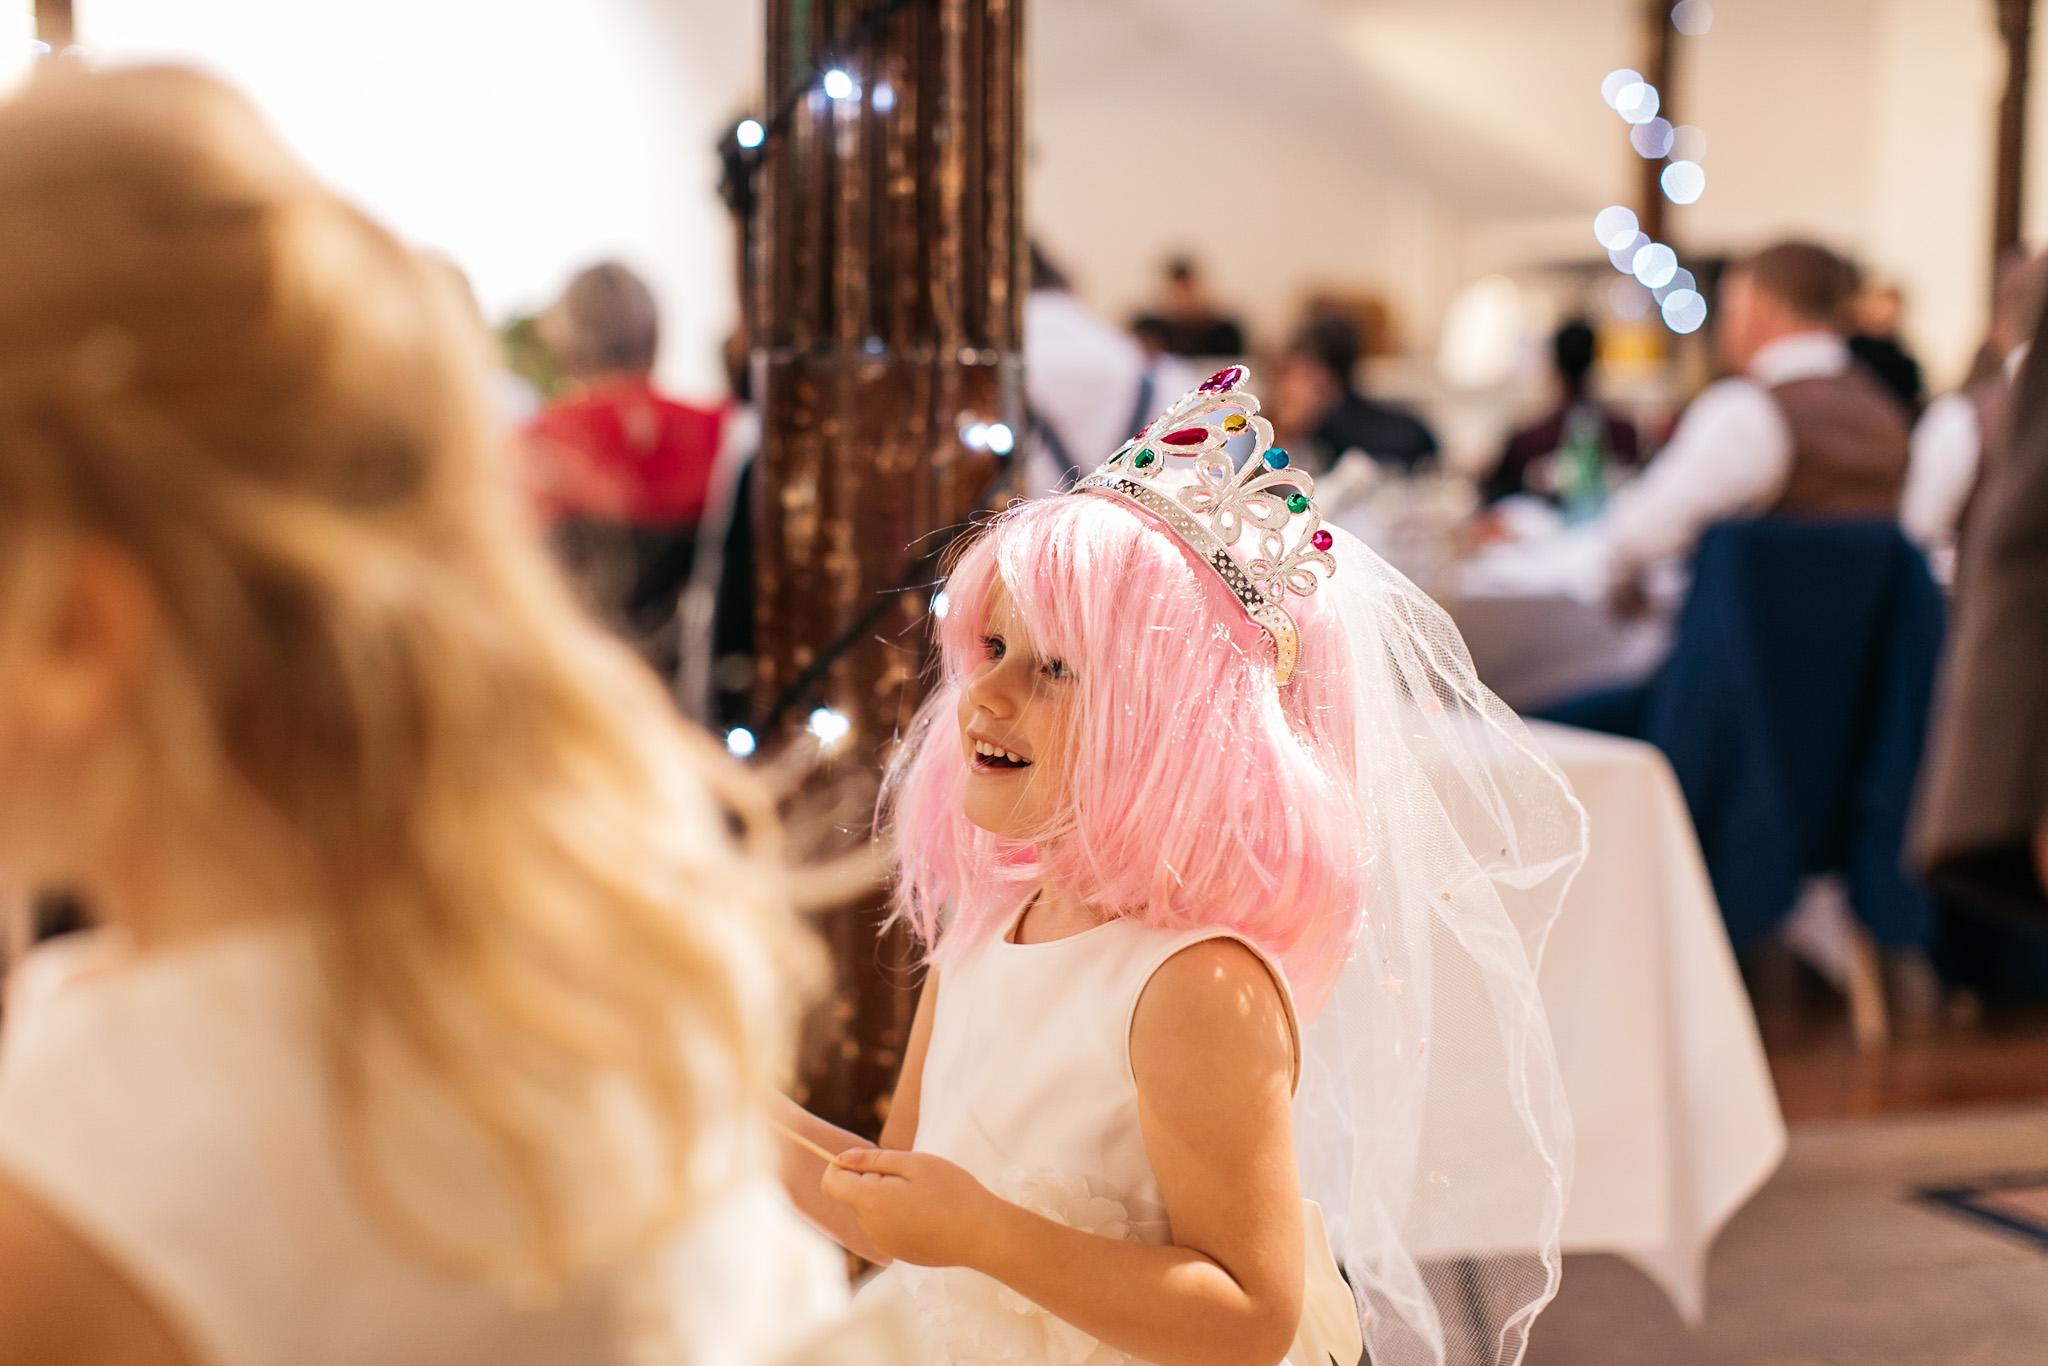 st_andrews_fabrica_brighton_wedding_613.jpg